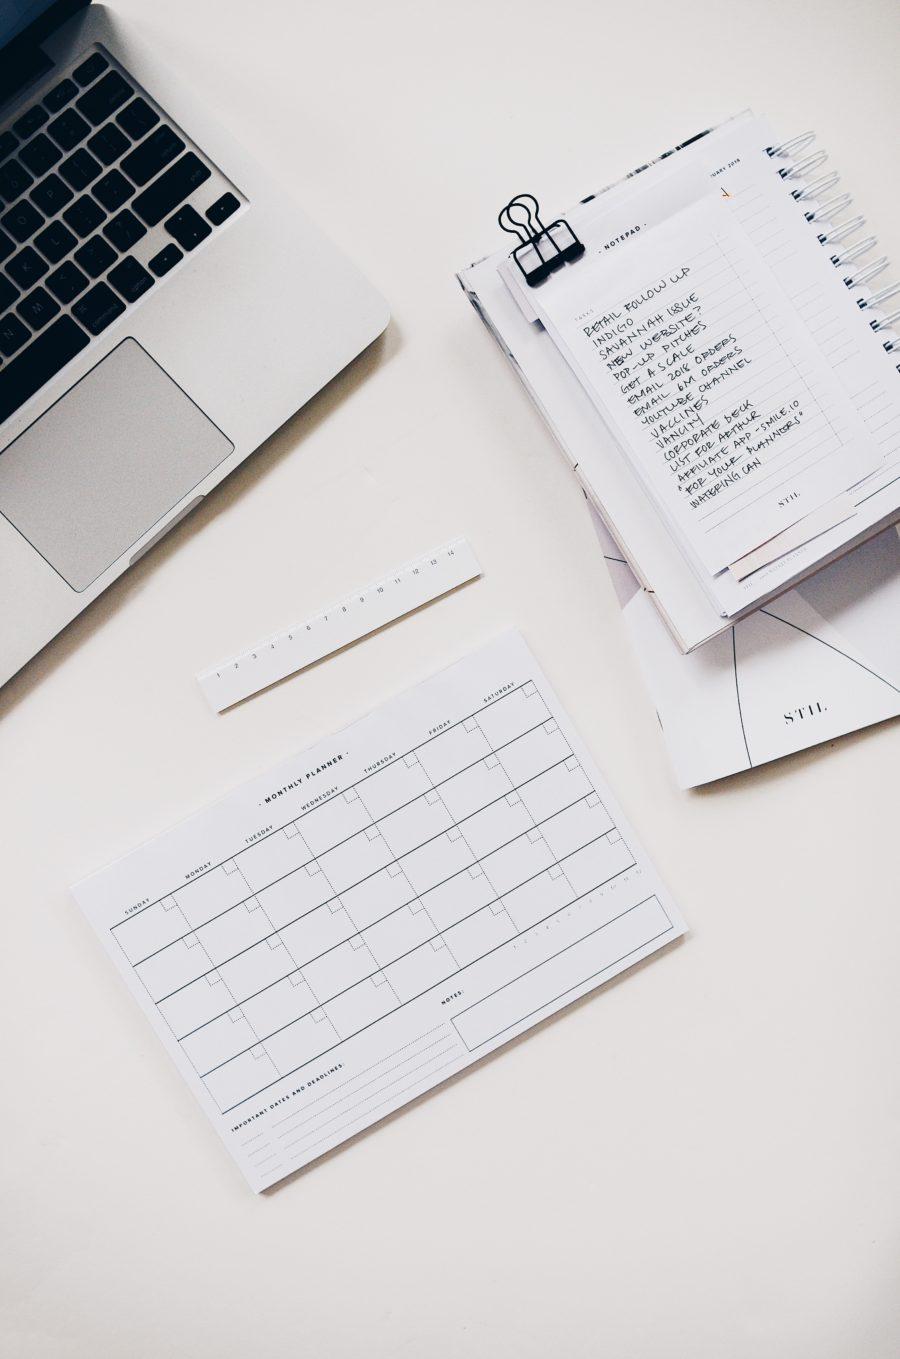 to-do-lijstje, to do's, werken, tips